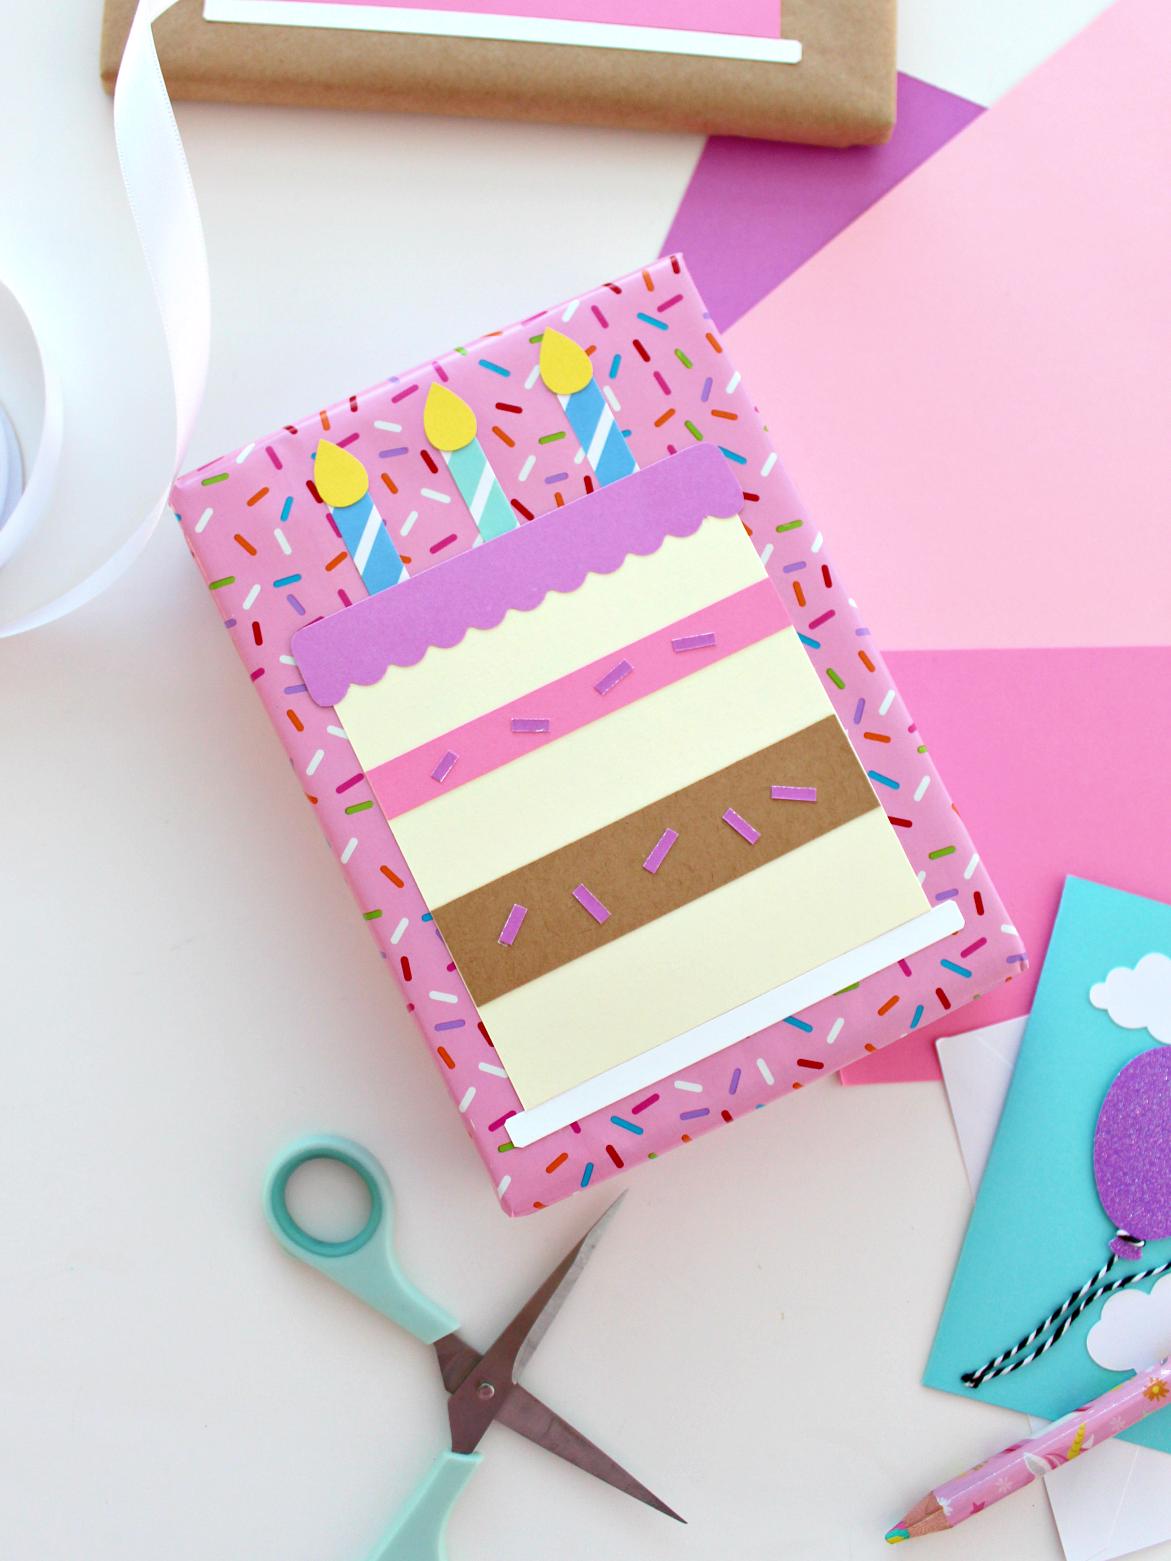 DIY BIRTHDAY CAKE PRESENTS